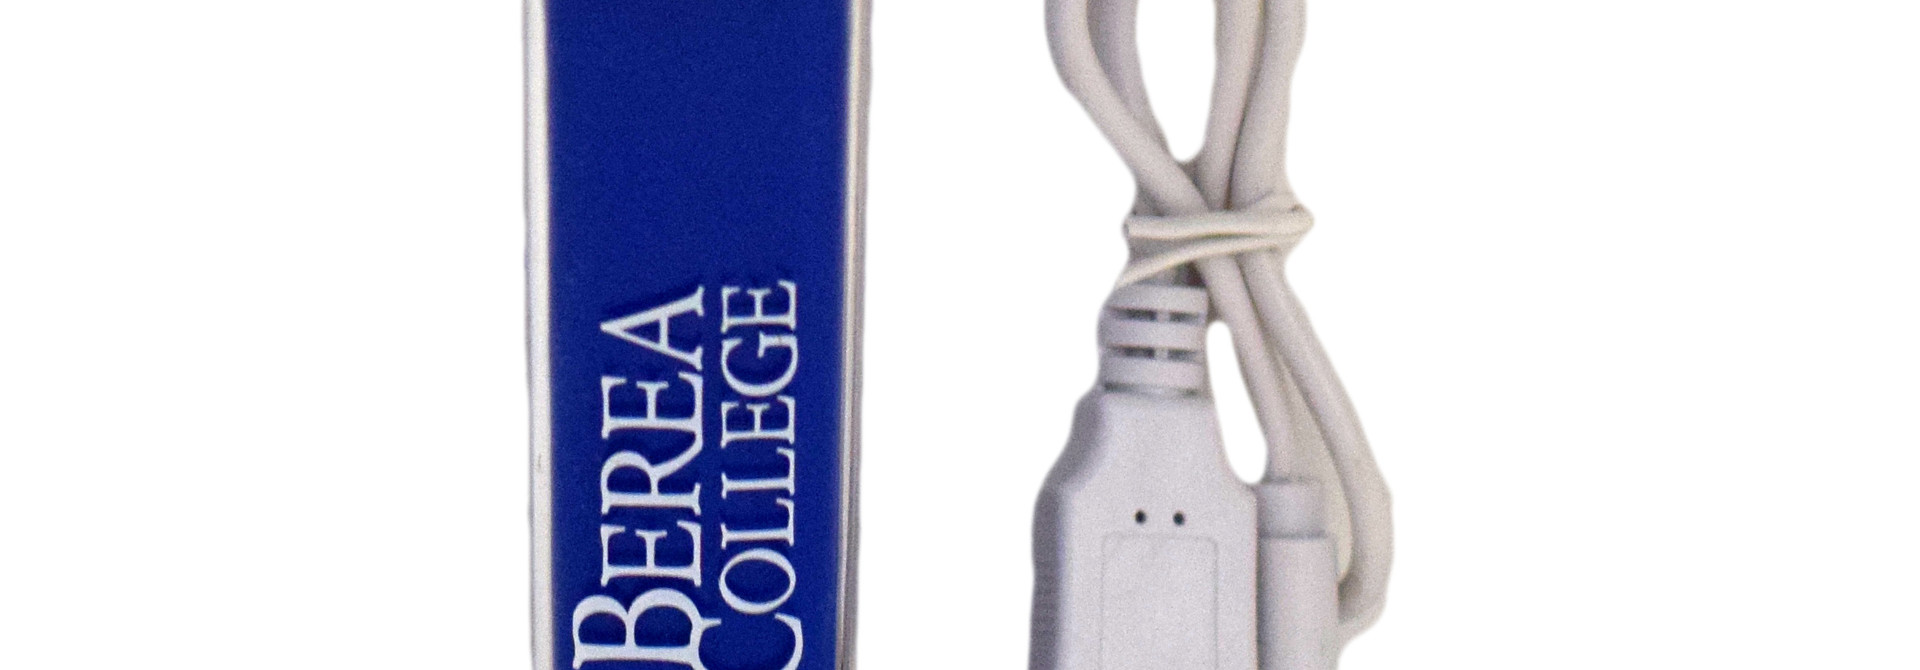 Portable Power Bank, Stacked Logo